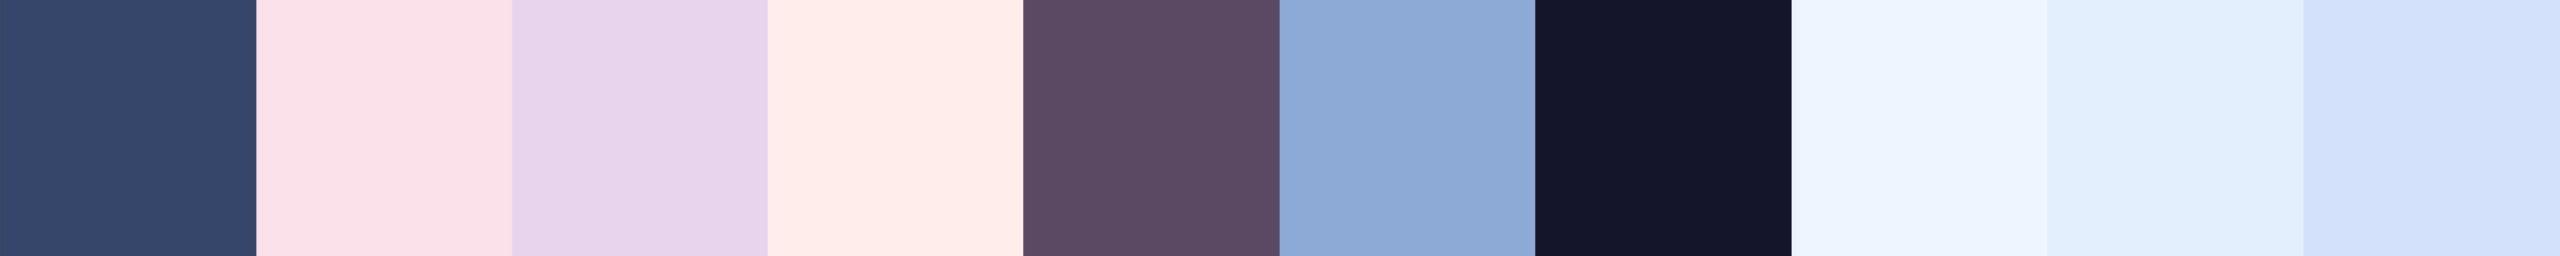 174 Parawoo Color Palette